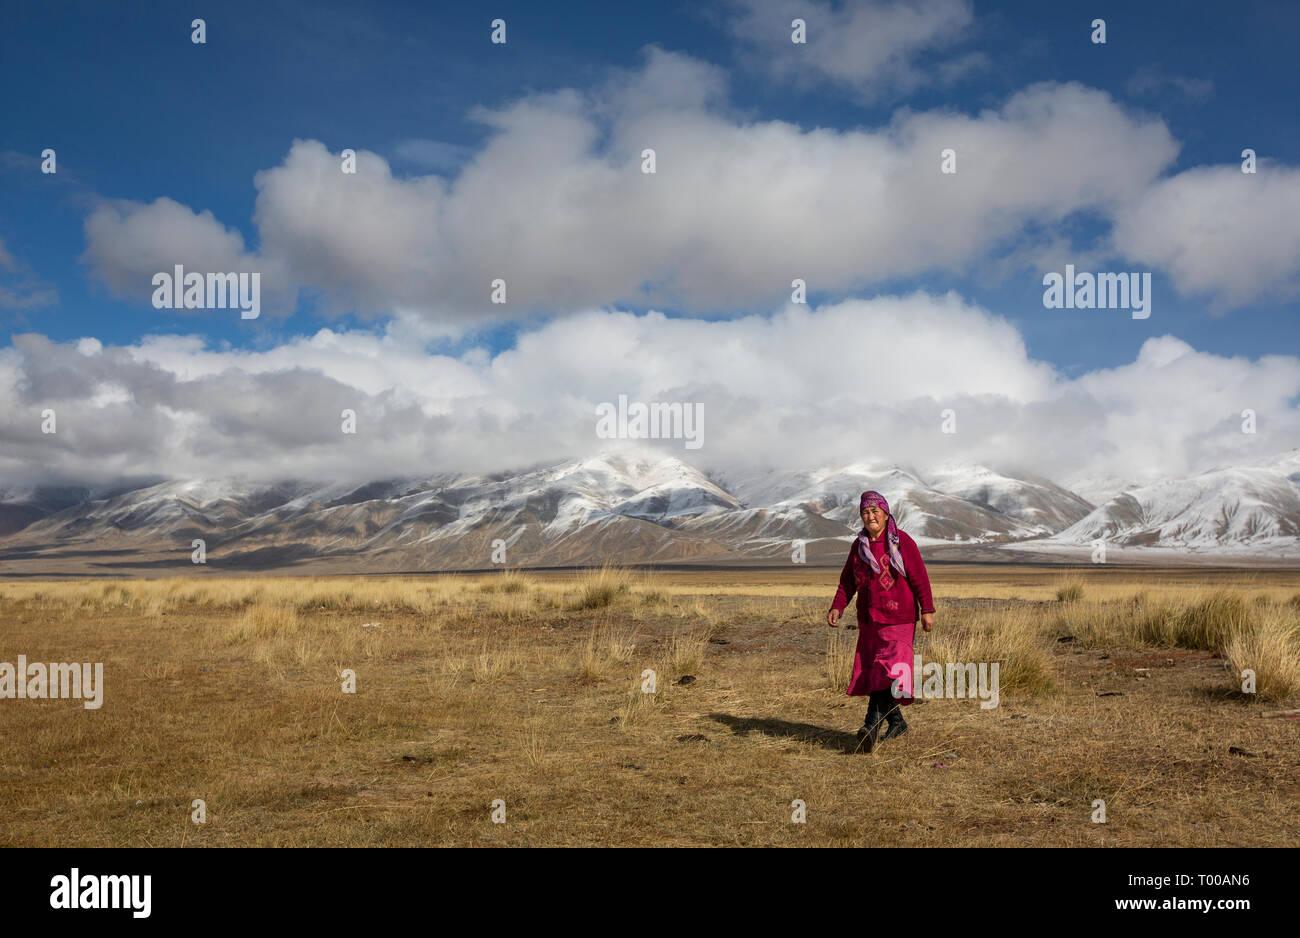 Bayan Olgii, Mongolia, 29th September 2015: Mongoilian kazakh nomad  woman  in the landscape of Western Mongolia Stock Photo